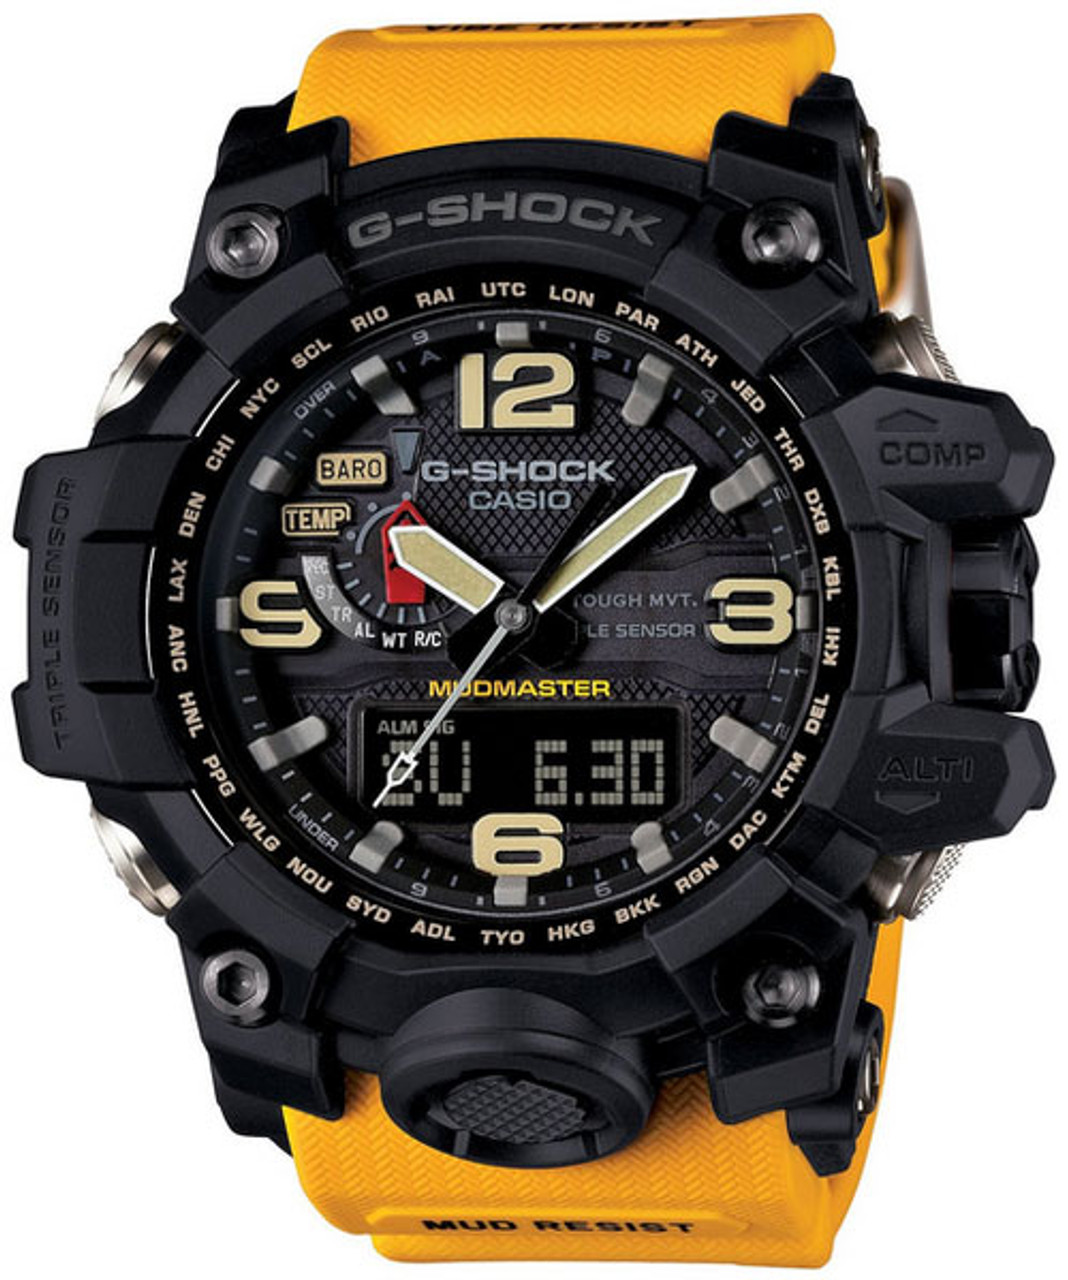 G-Shock Mudmaster GWG-1000-1A9